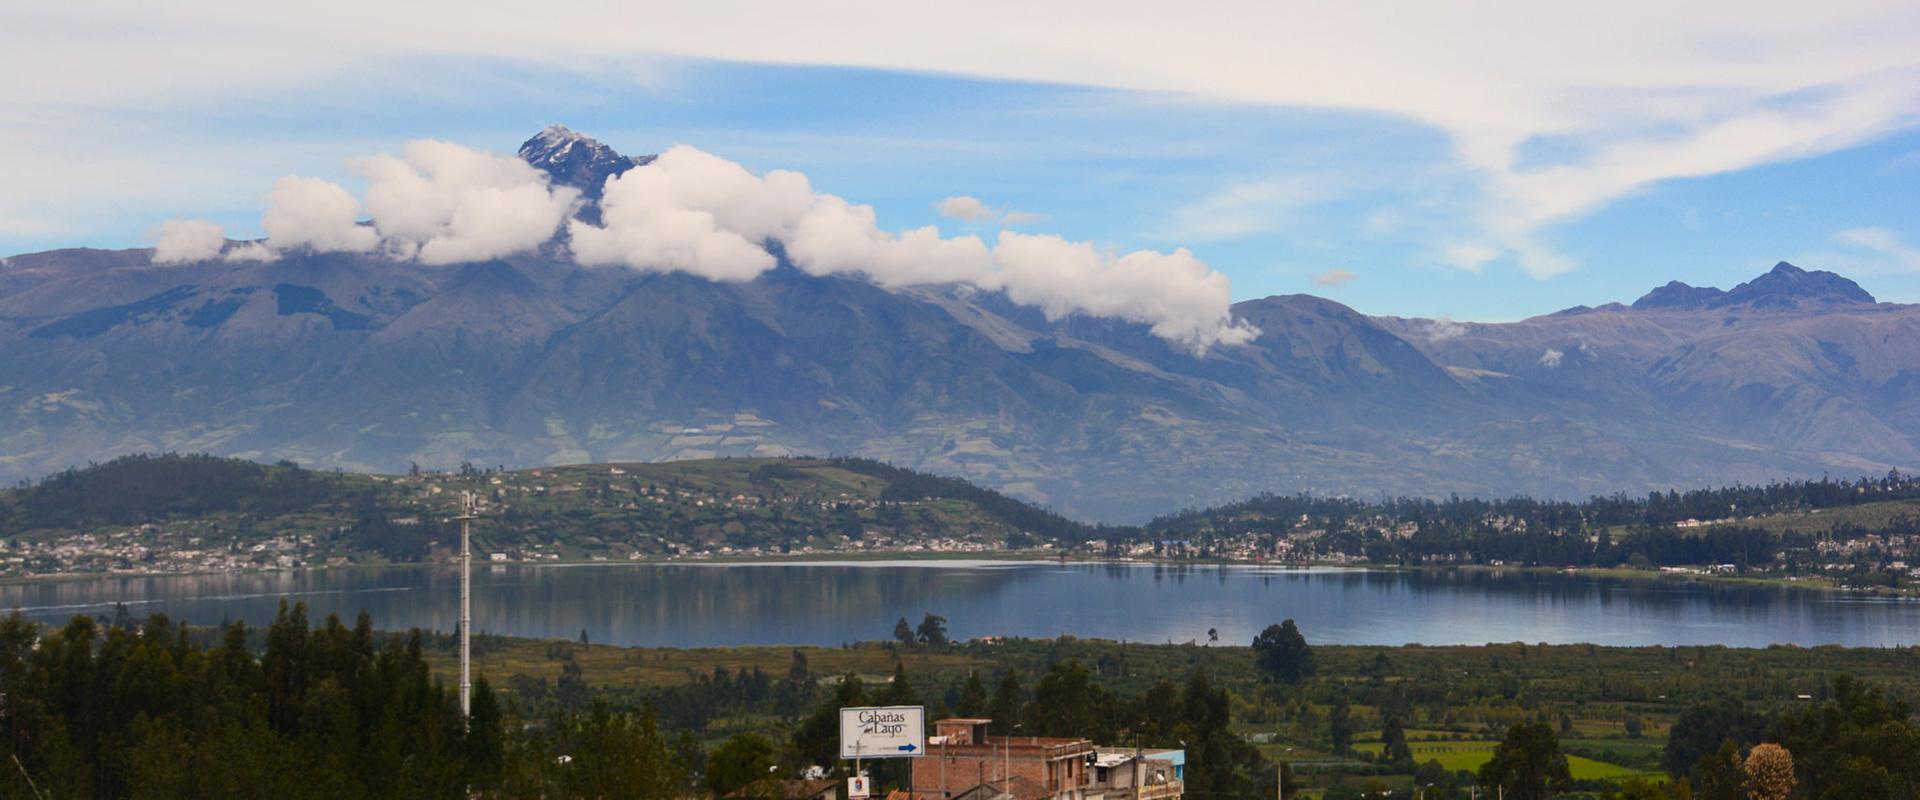 San Pablo Lake